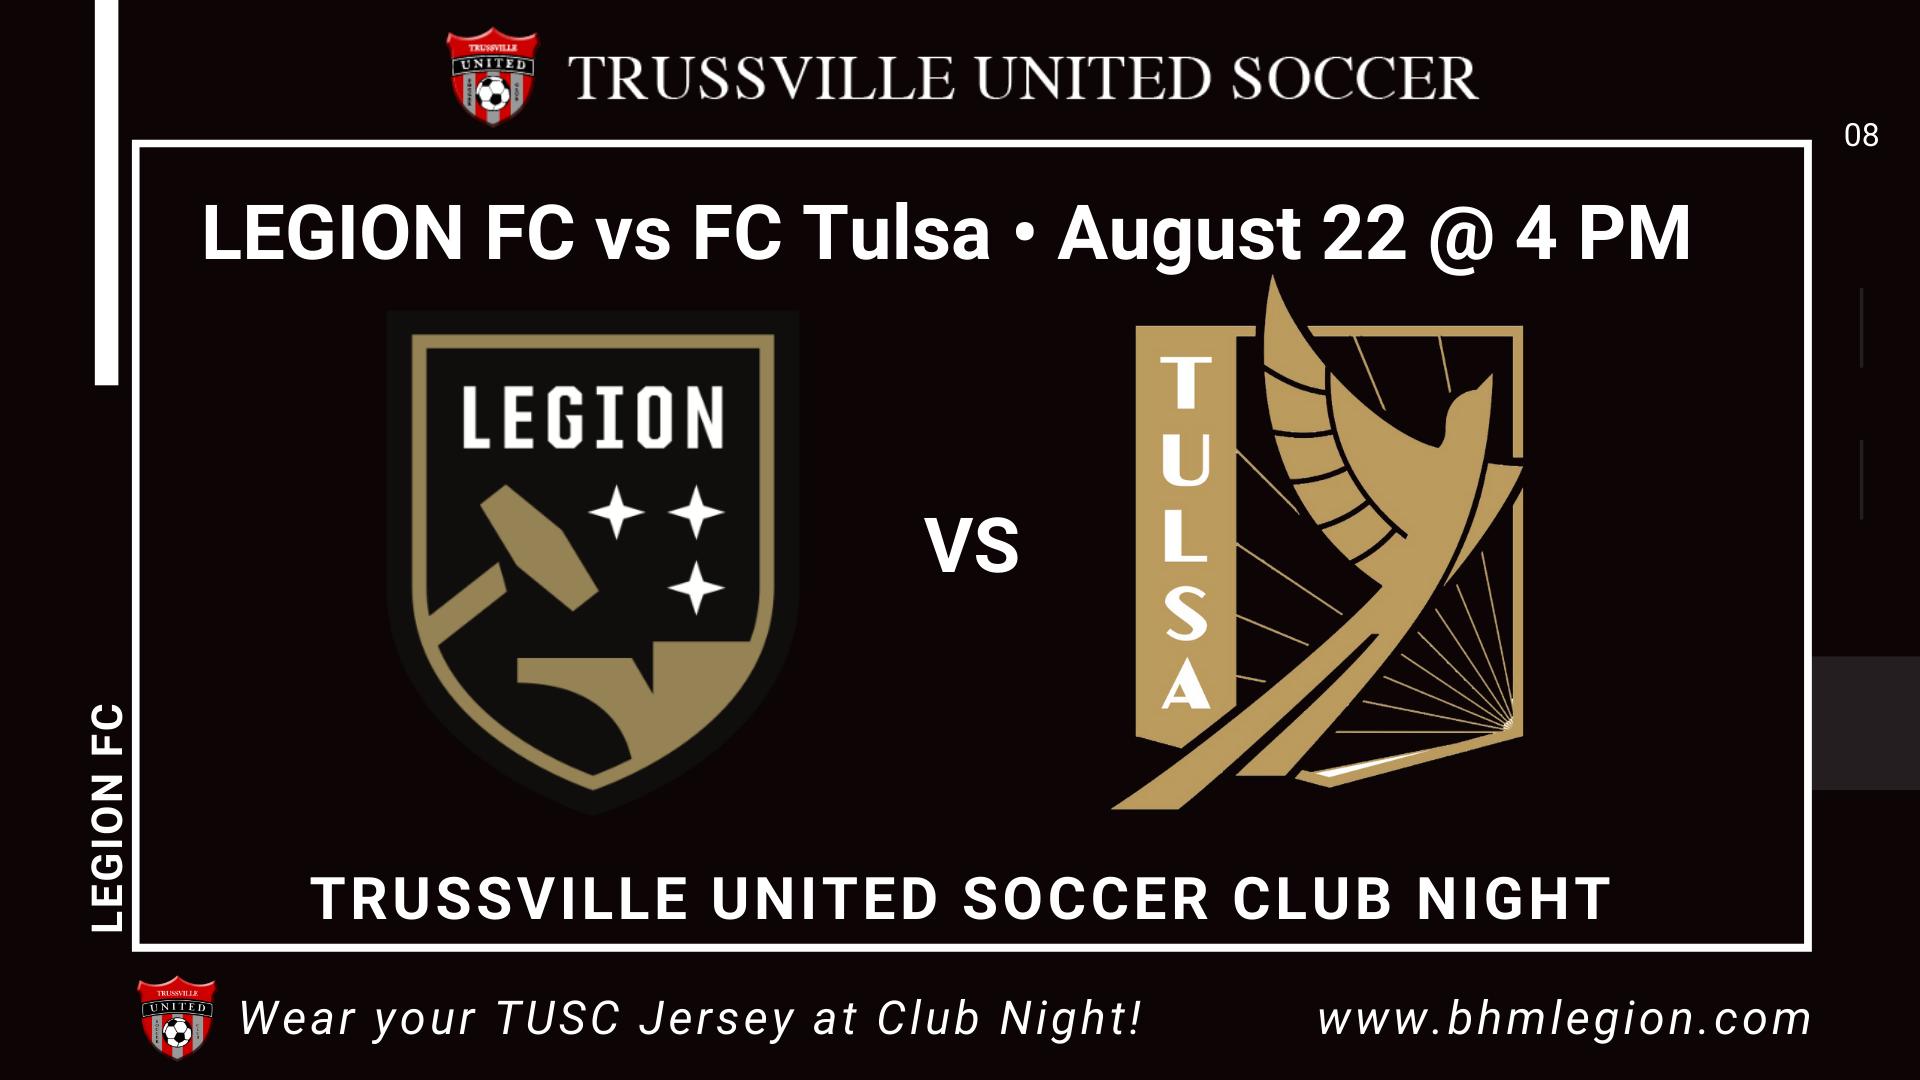 1920x1080-TUSC-Legion-FC-Club-Night